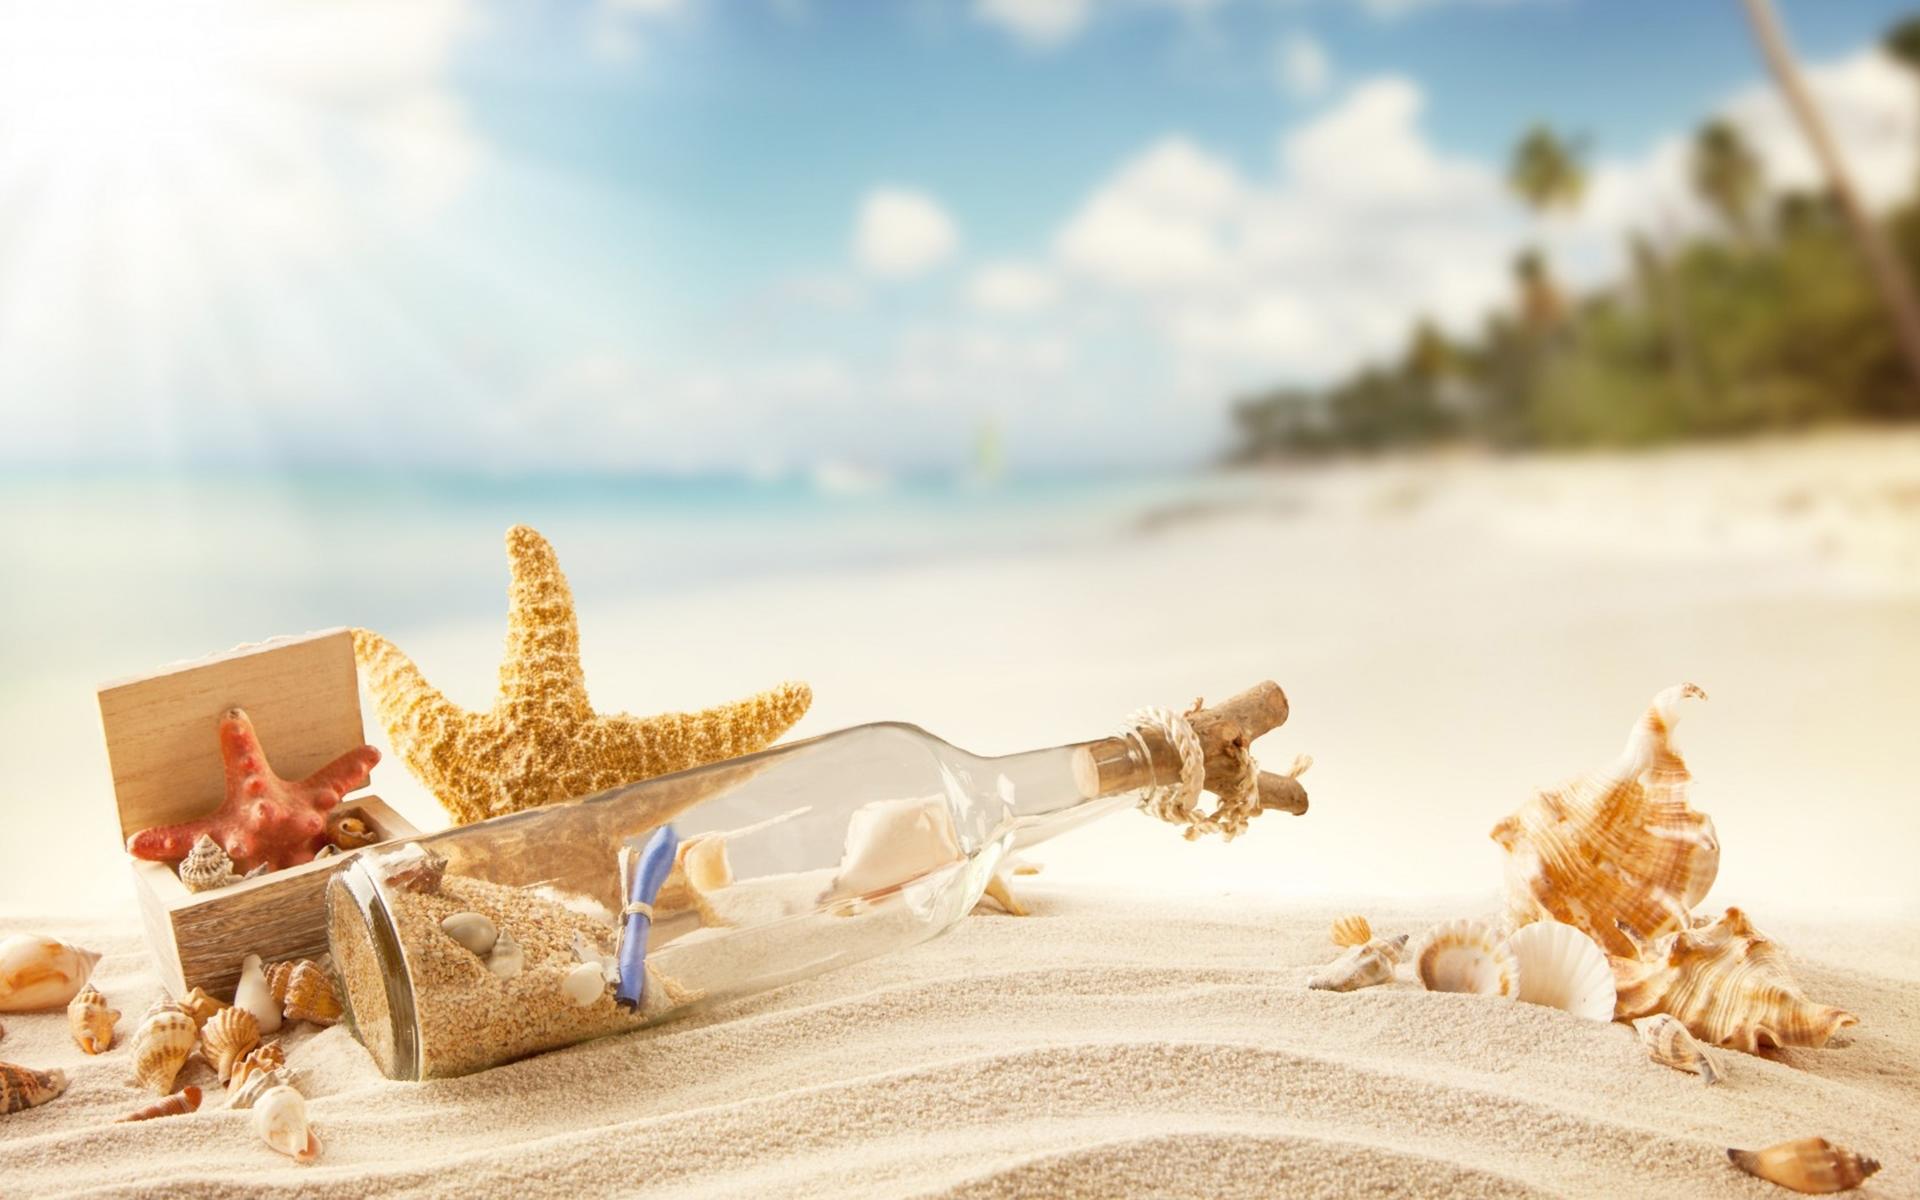 beach sea shell collection, bottle, sand widescreen wallpaper | wide